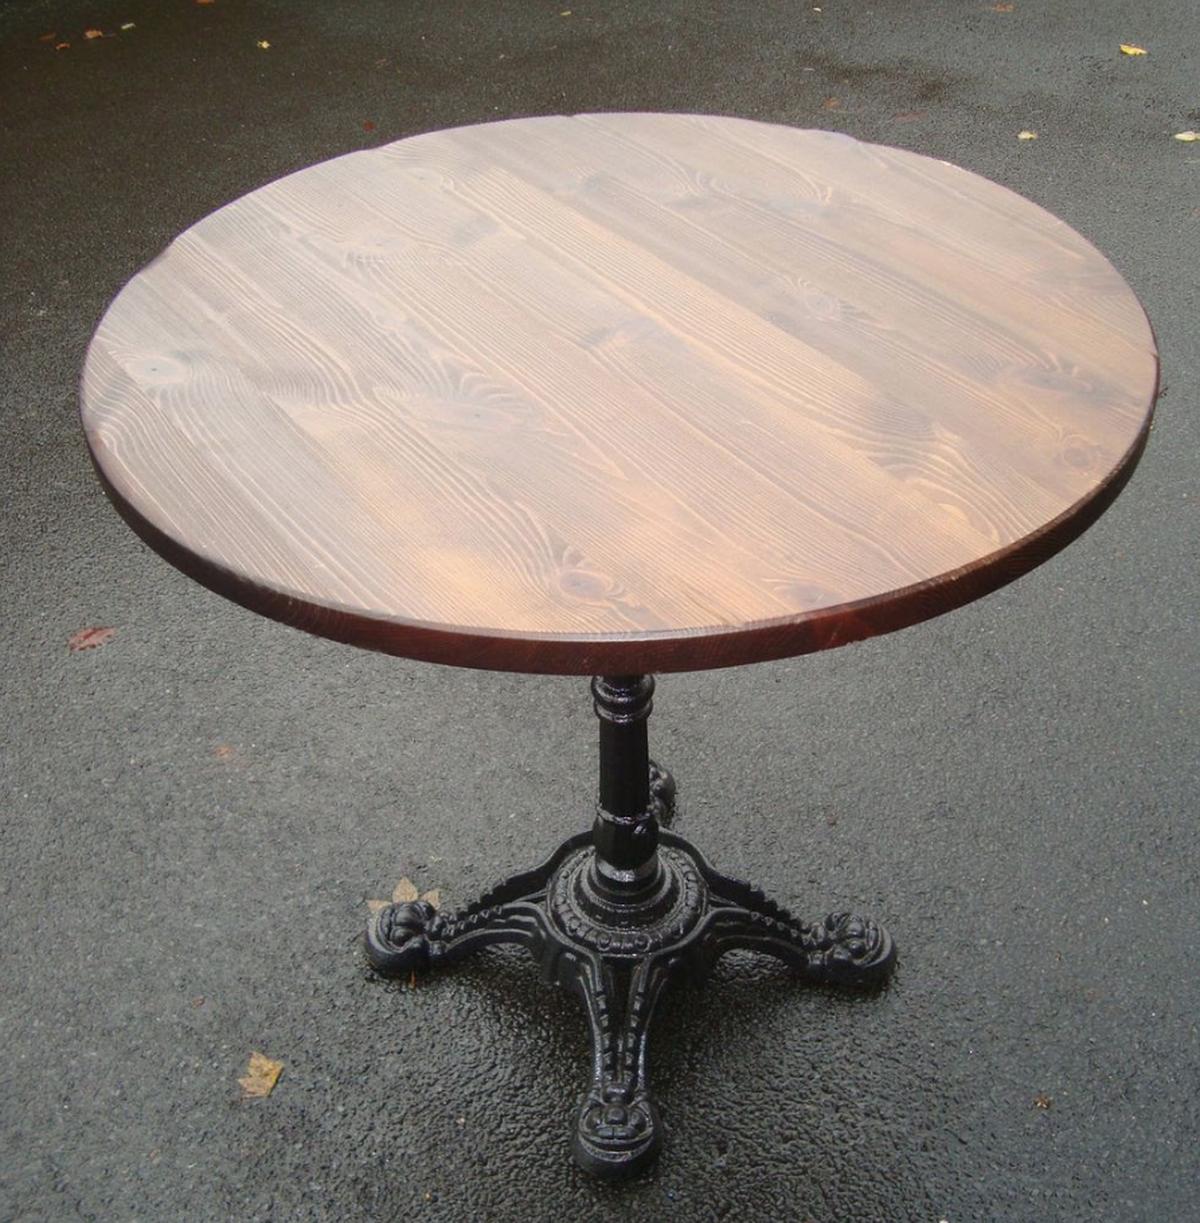 Secondhand pub equipment pub tables bolero cast iron table leg iron cast table bases watchthetrailerfo